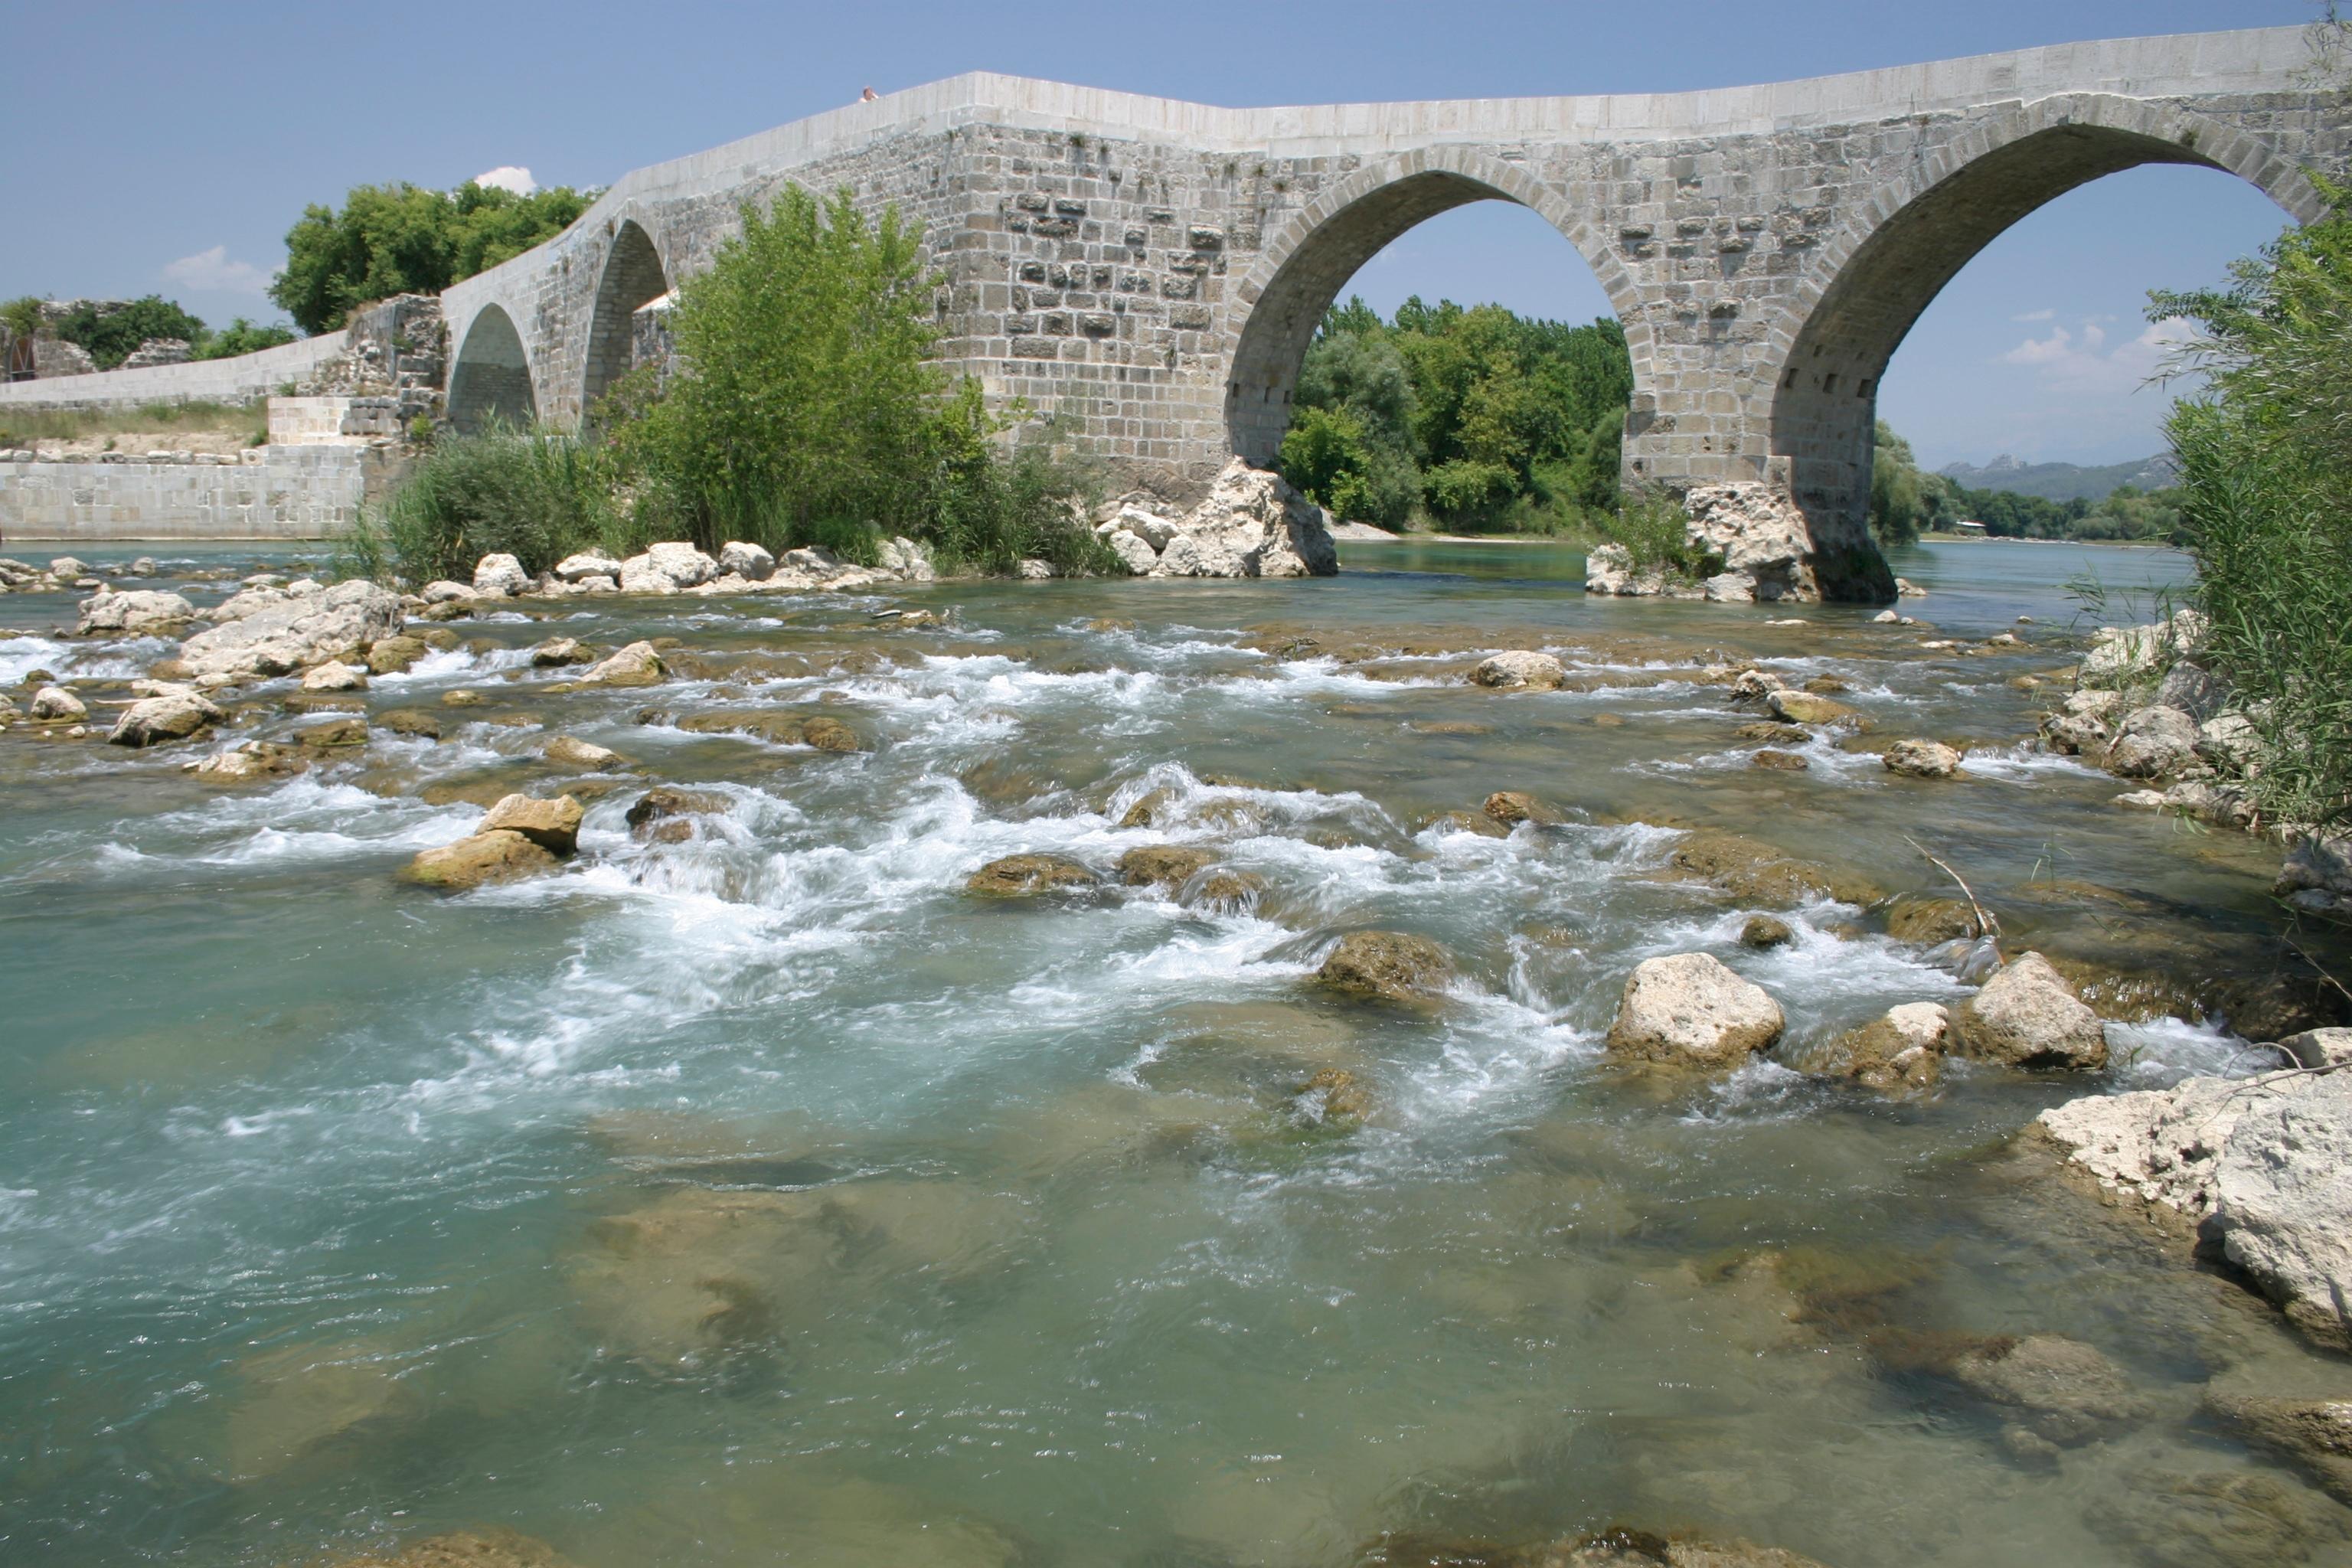 File:Eurymedon Bridge, Aspendos, Turkey. Pic 01.jpg ...